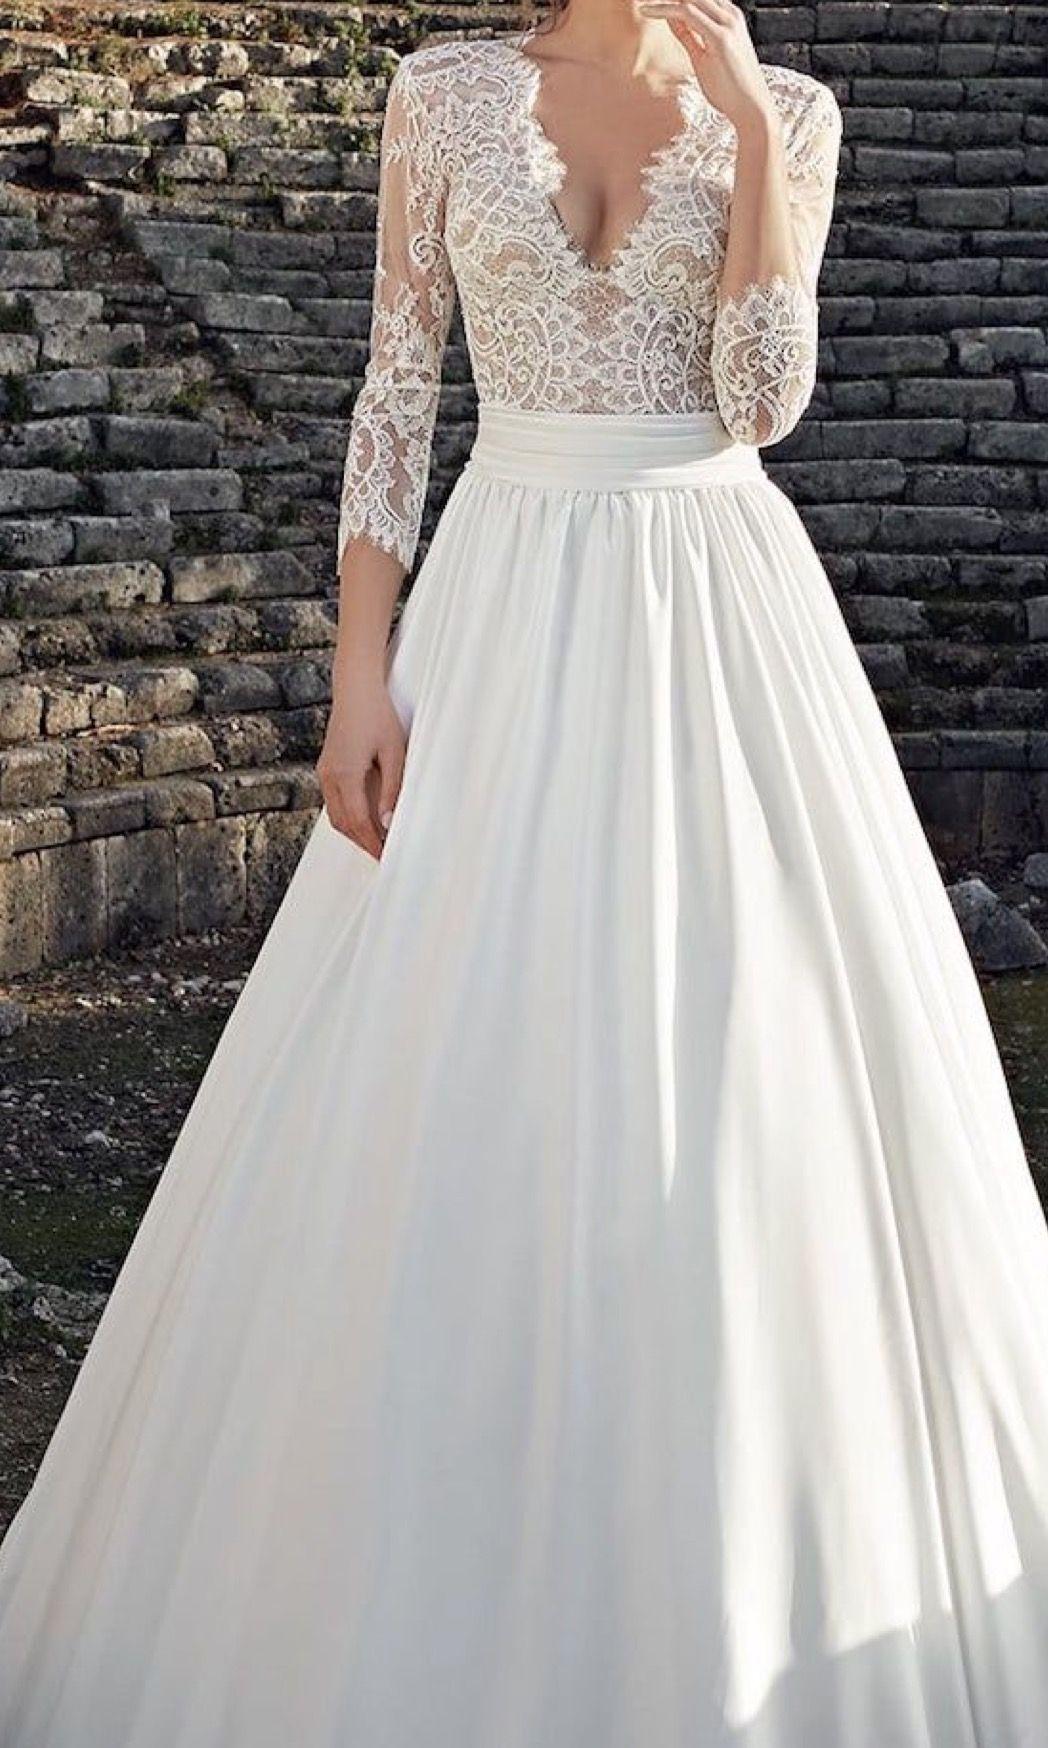 Pin by ulrika on brudklänningar pinterest wedding dress